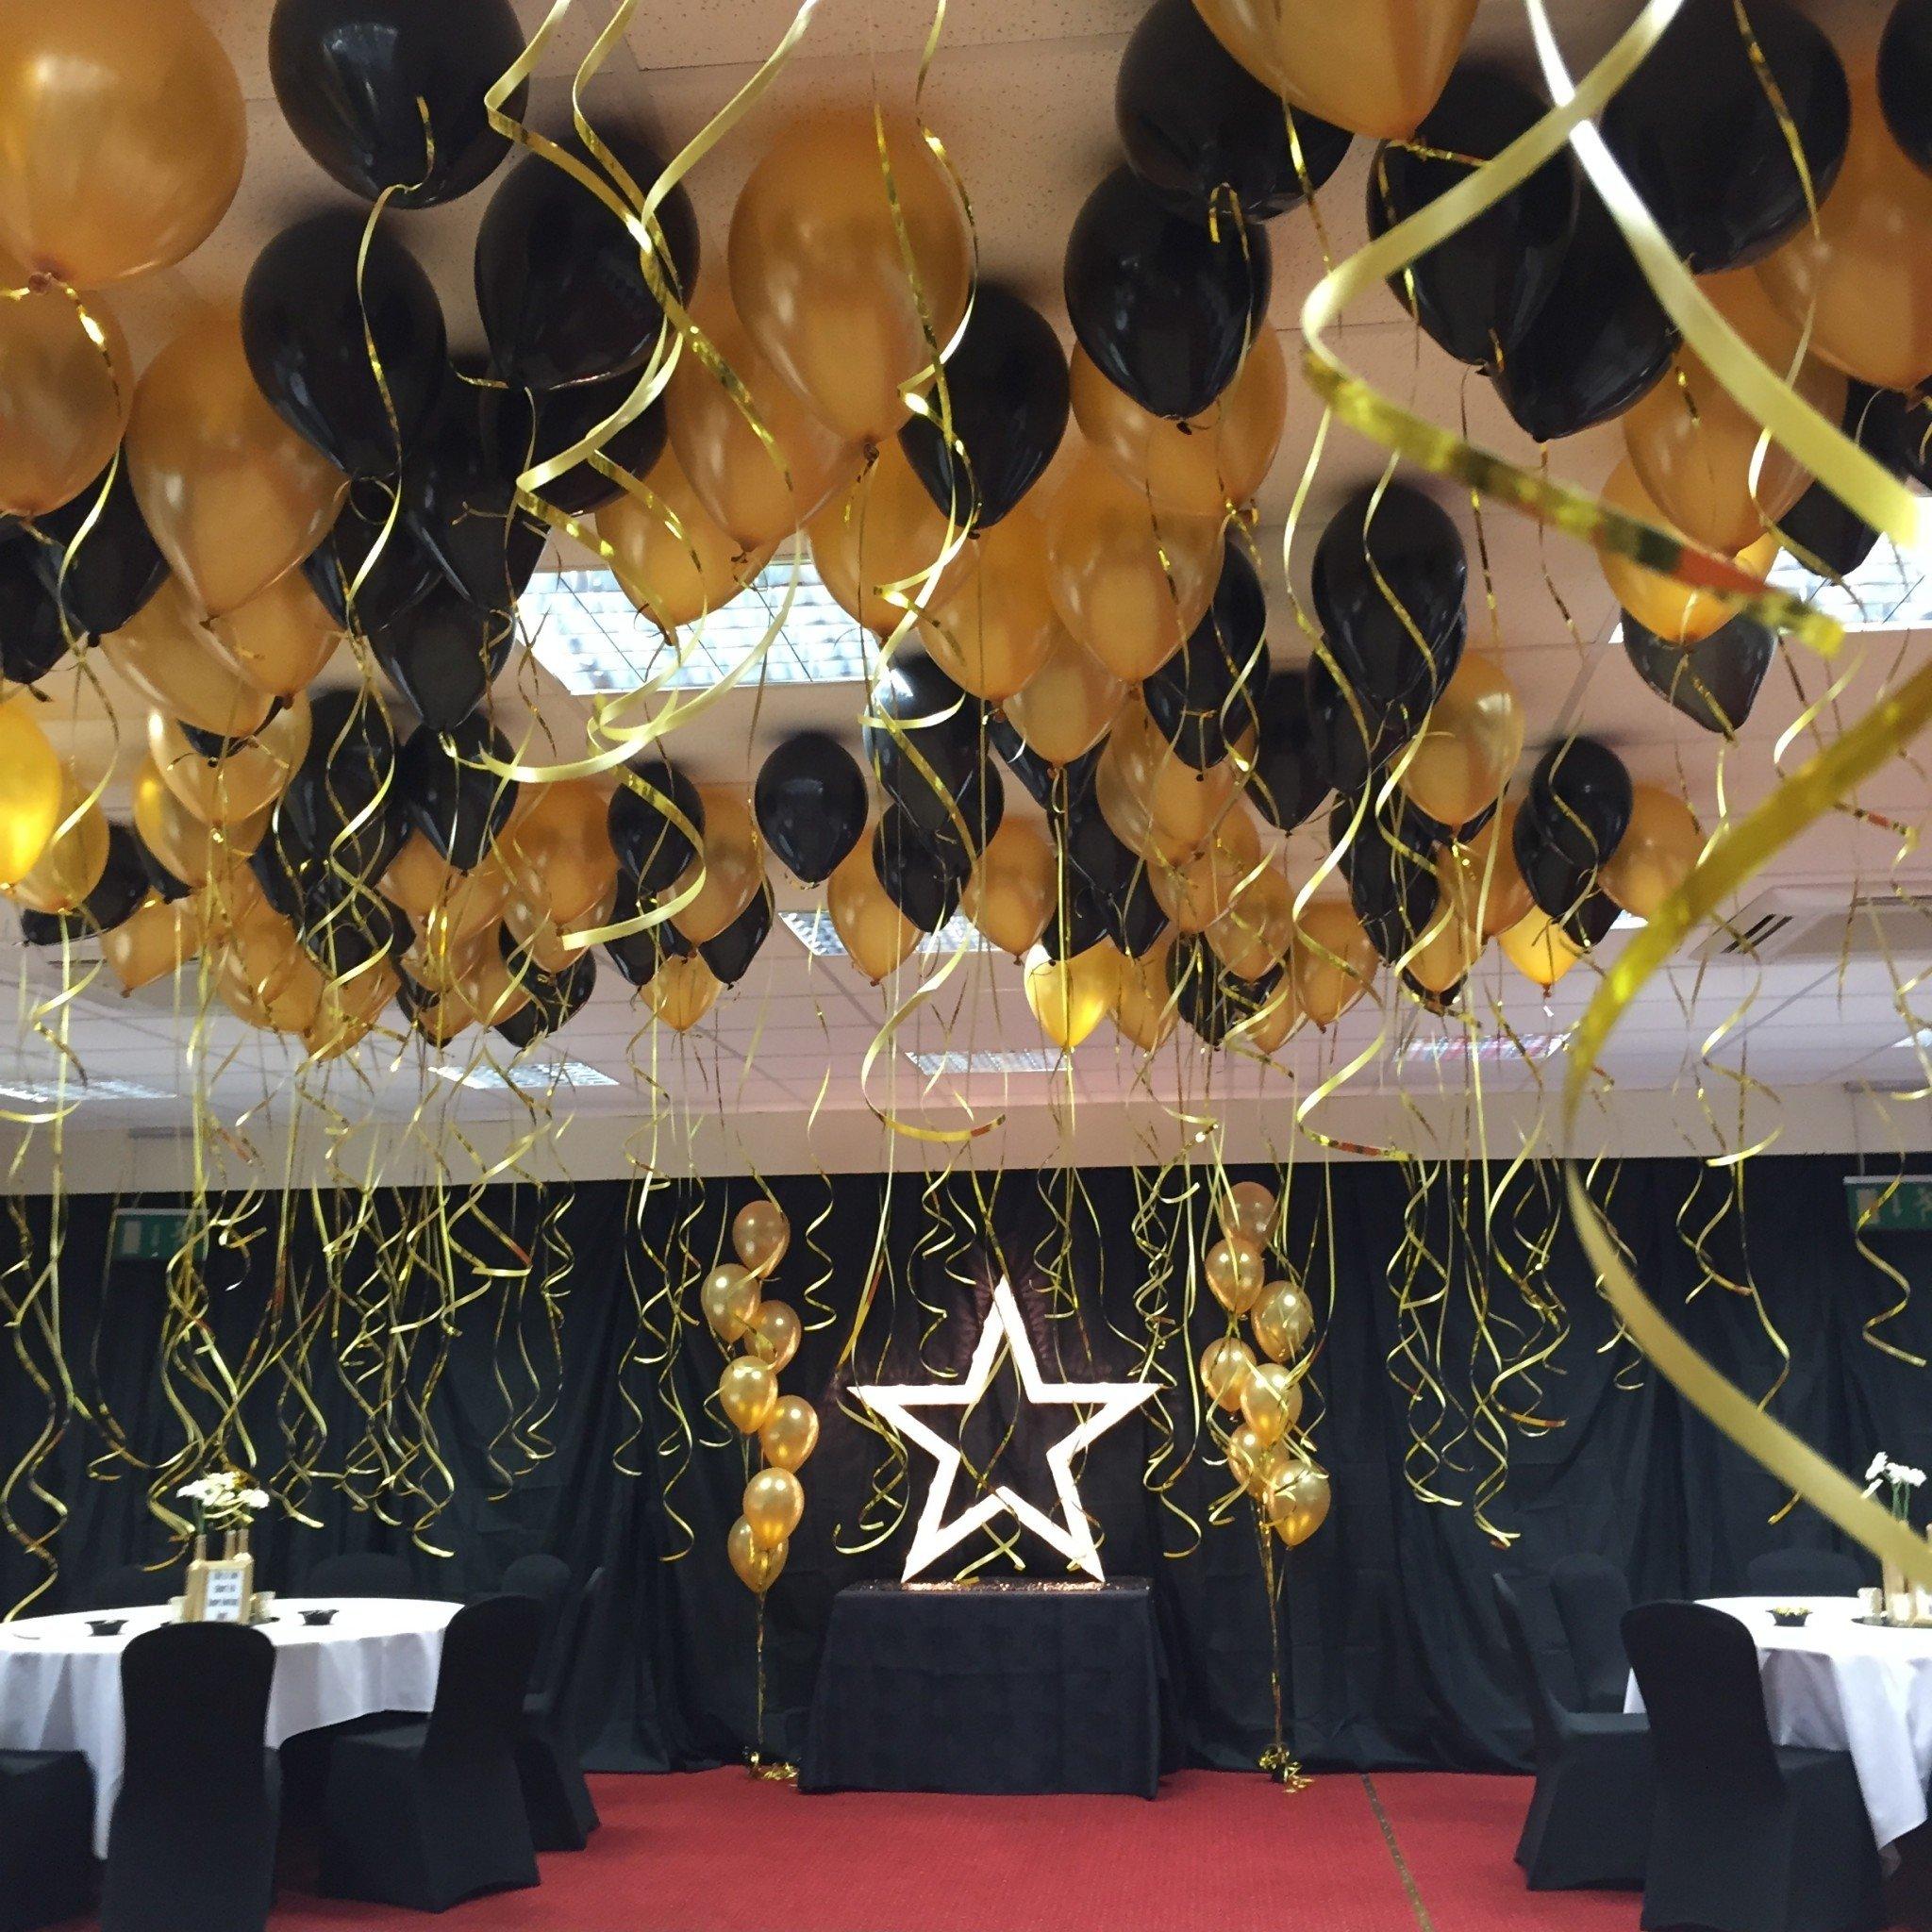 10 Stunning 50 Wedding Anniversary Party Ideas 50th wedding anniversary decorations this inspiration golden wedding 2021